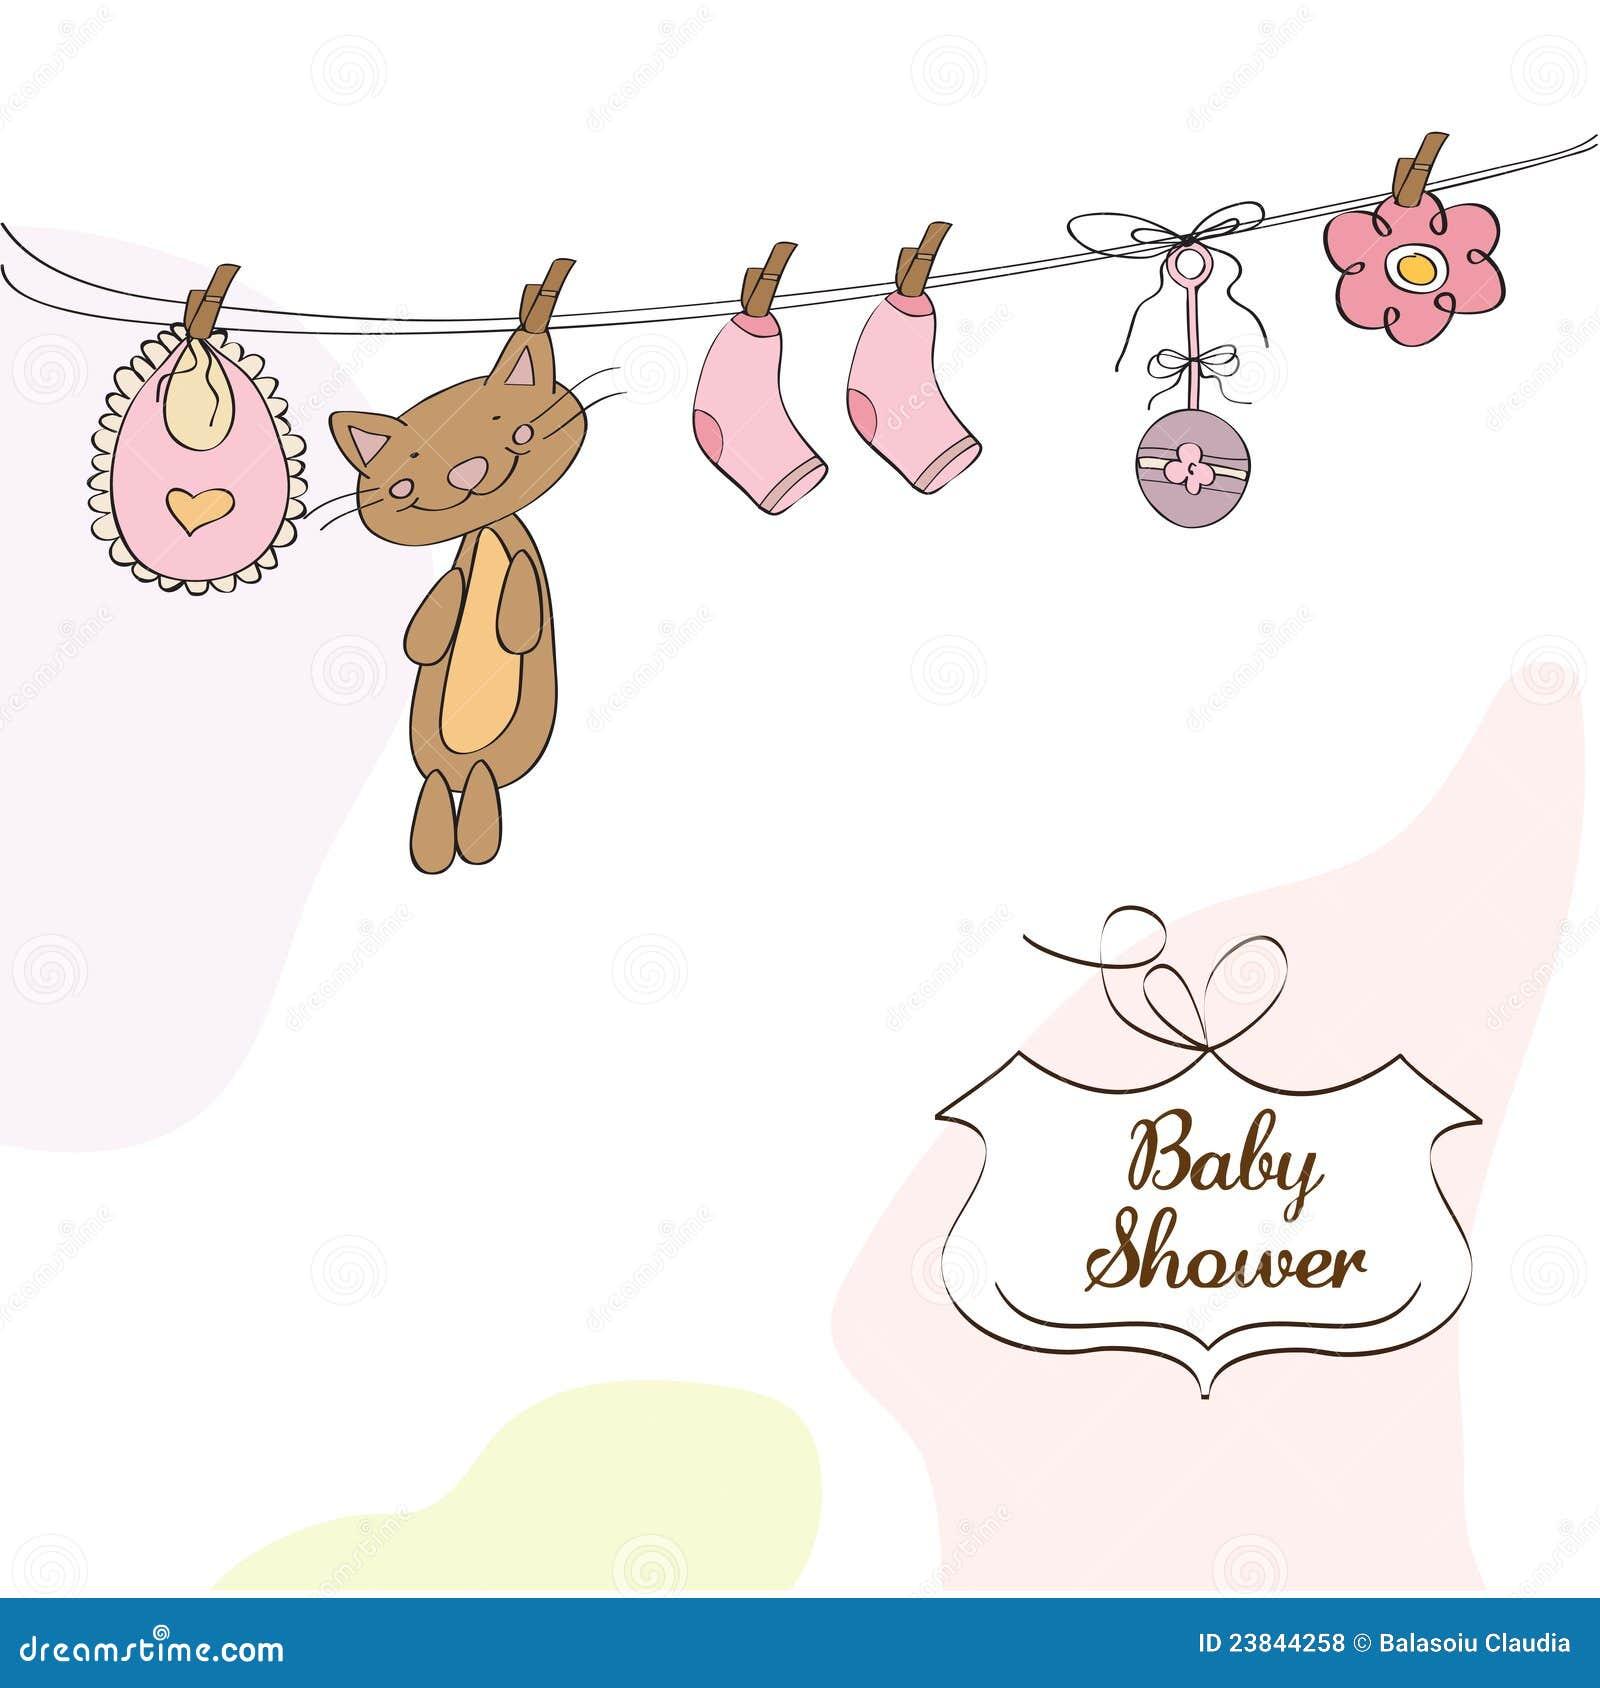 Baby Shower Invitations For Girls Templates Baby girl shower ...